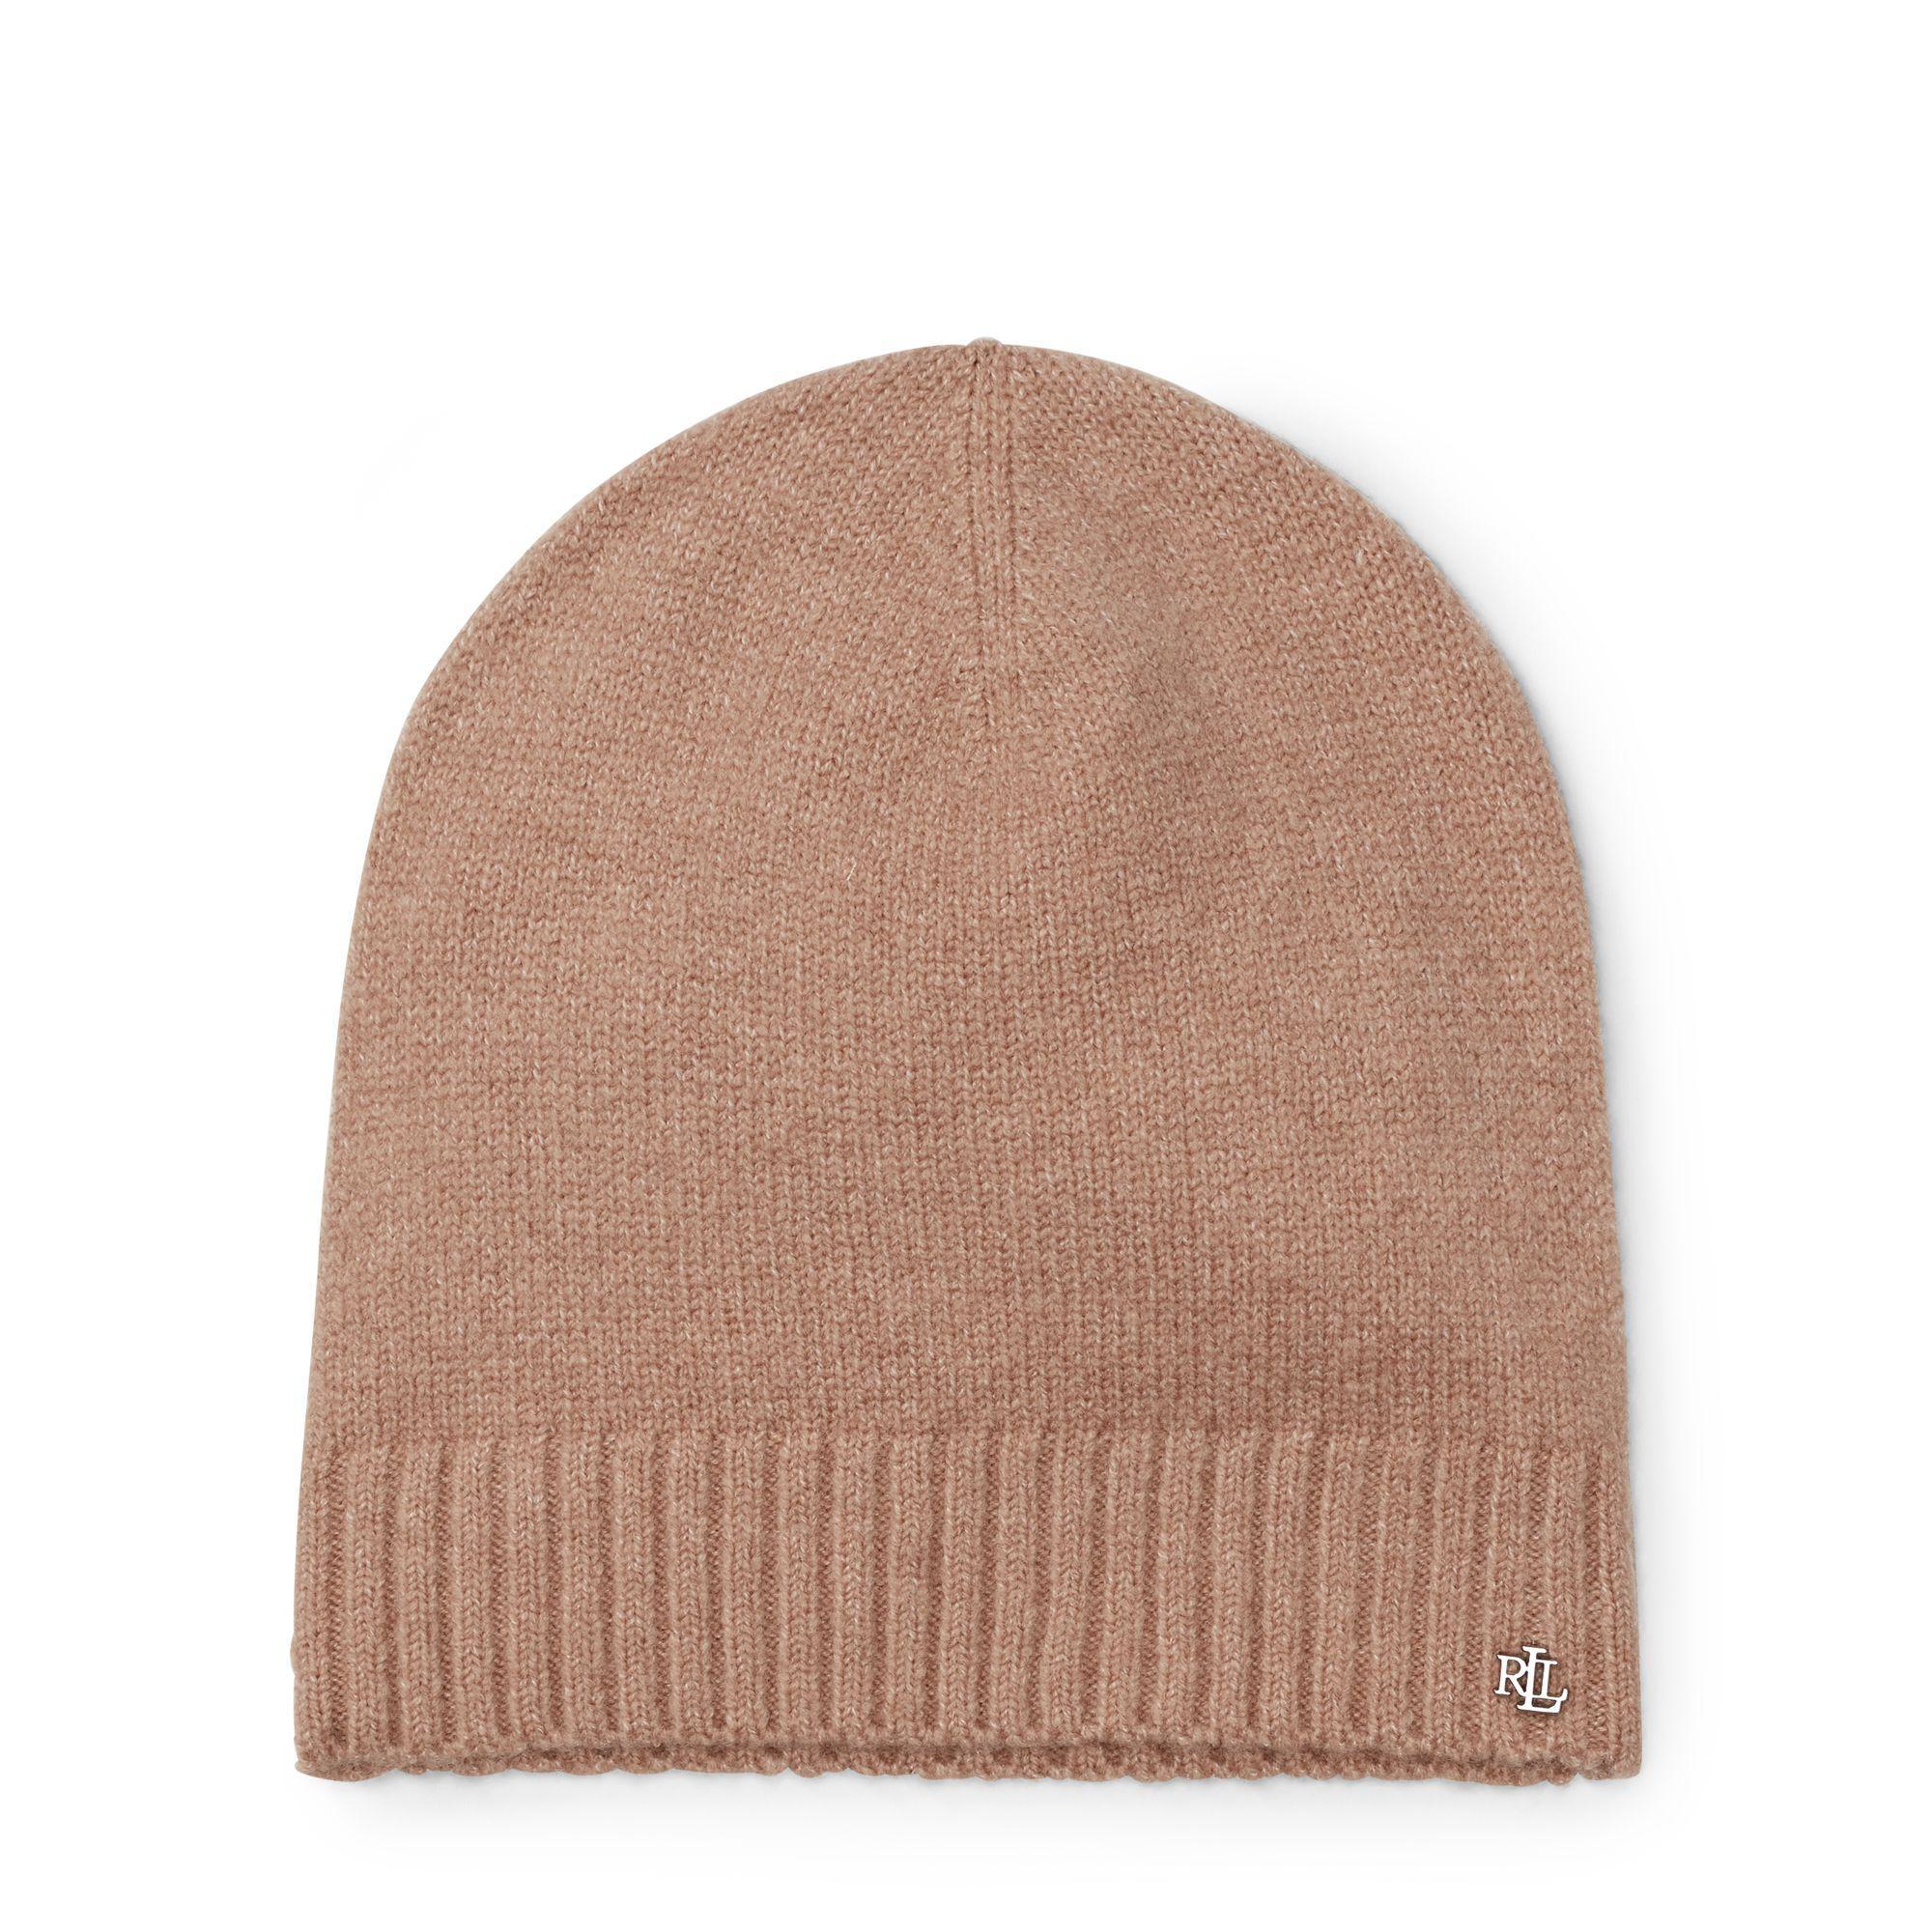 2c3c19adca6376 Ralph Lauren Lrl Monogram Beanie Hat - Lyst